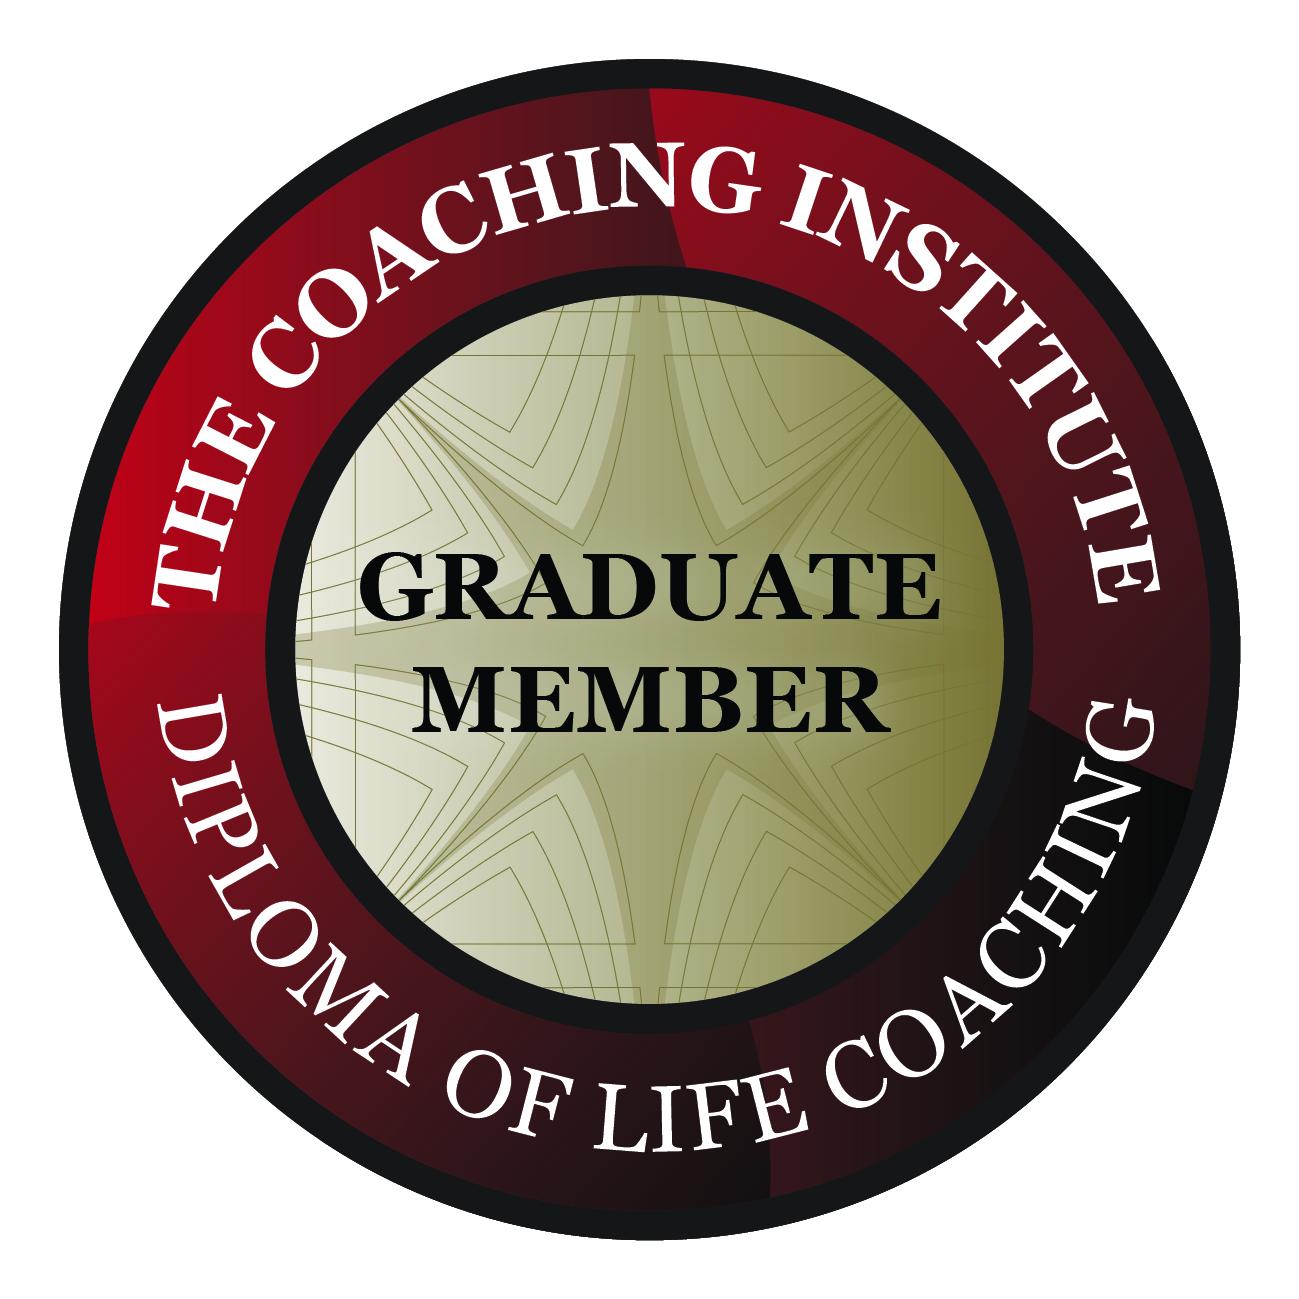 Diploma of Life Coaching  large